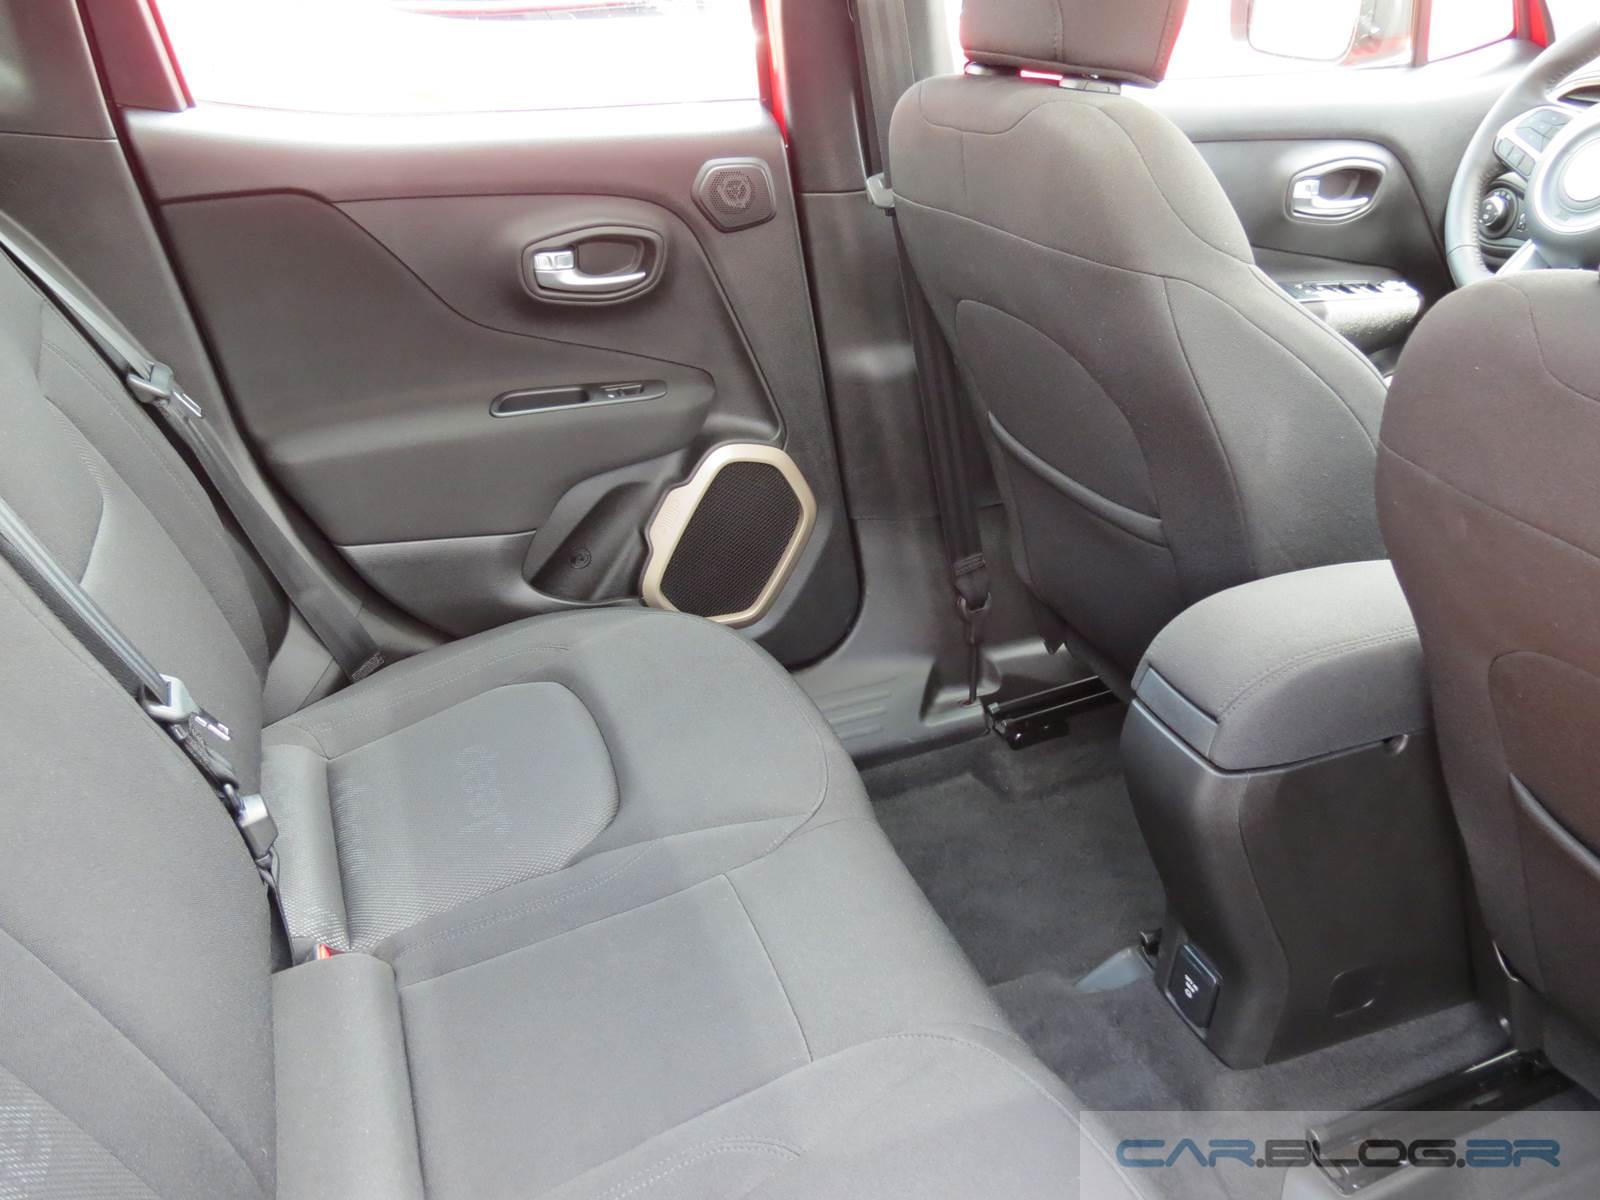 jeep renegade sport 2 0 diesel 4x4 v deo e fotos do interior car blog br. Black Bedroom Furniture Sets. Home Design Ideas